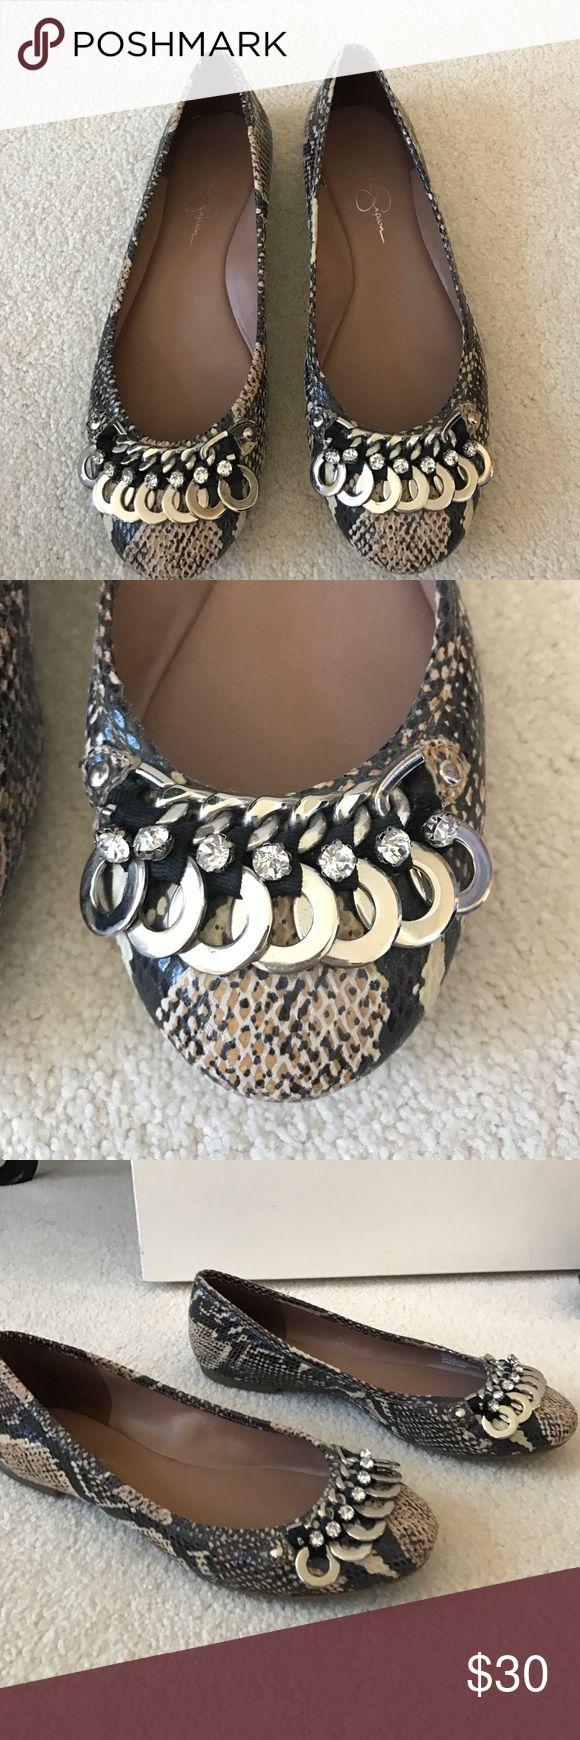 Jessica Simpson Flats Perfect condition!!!! Jessica Simpson flats Jessica Simpson Shoes Flats & Loafers